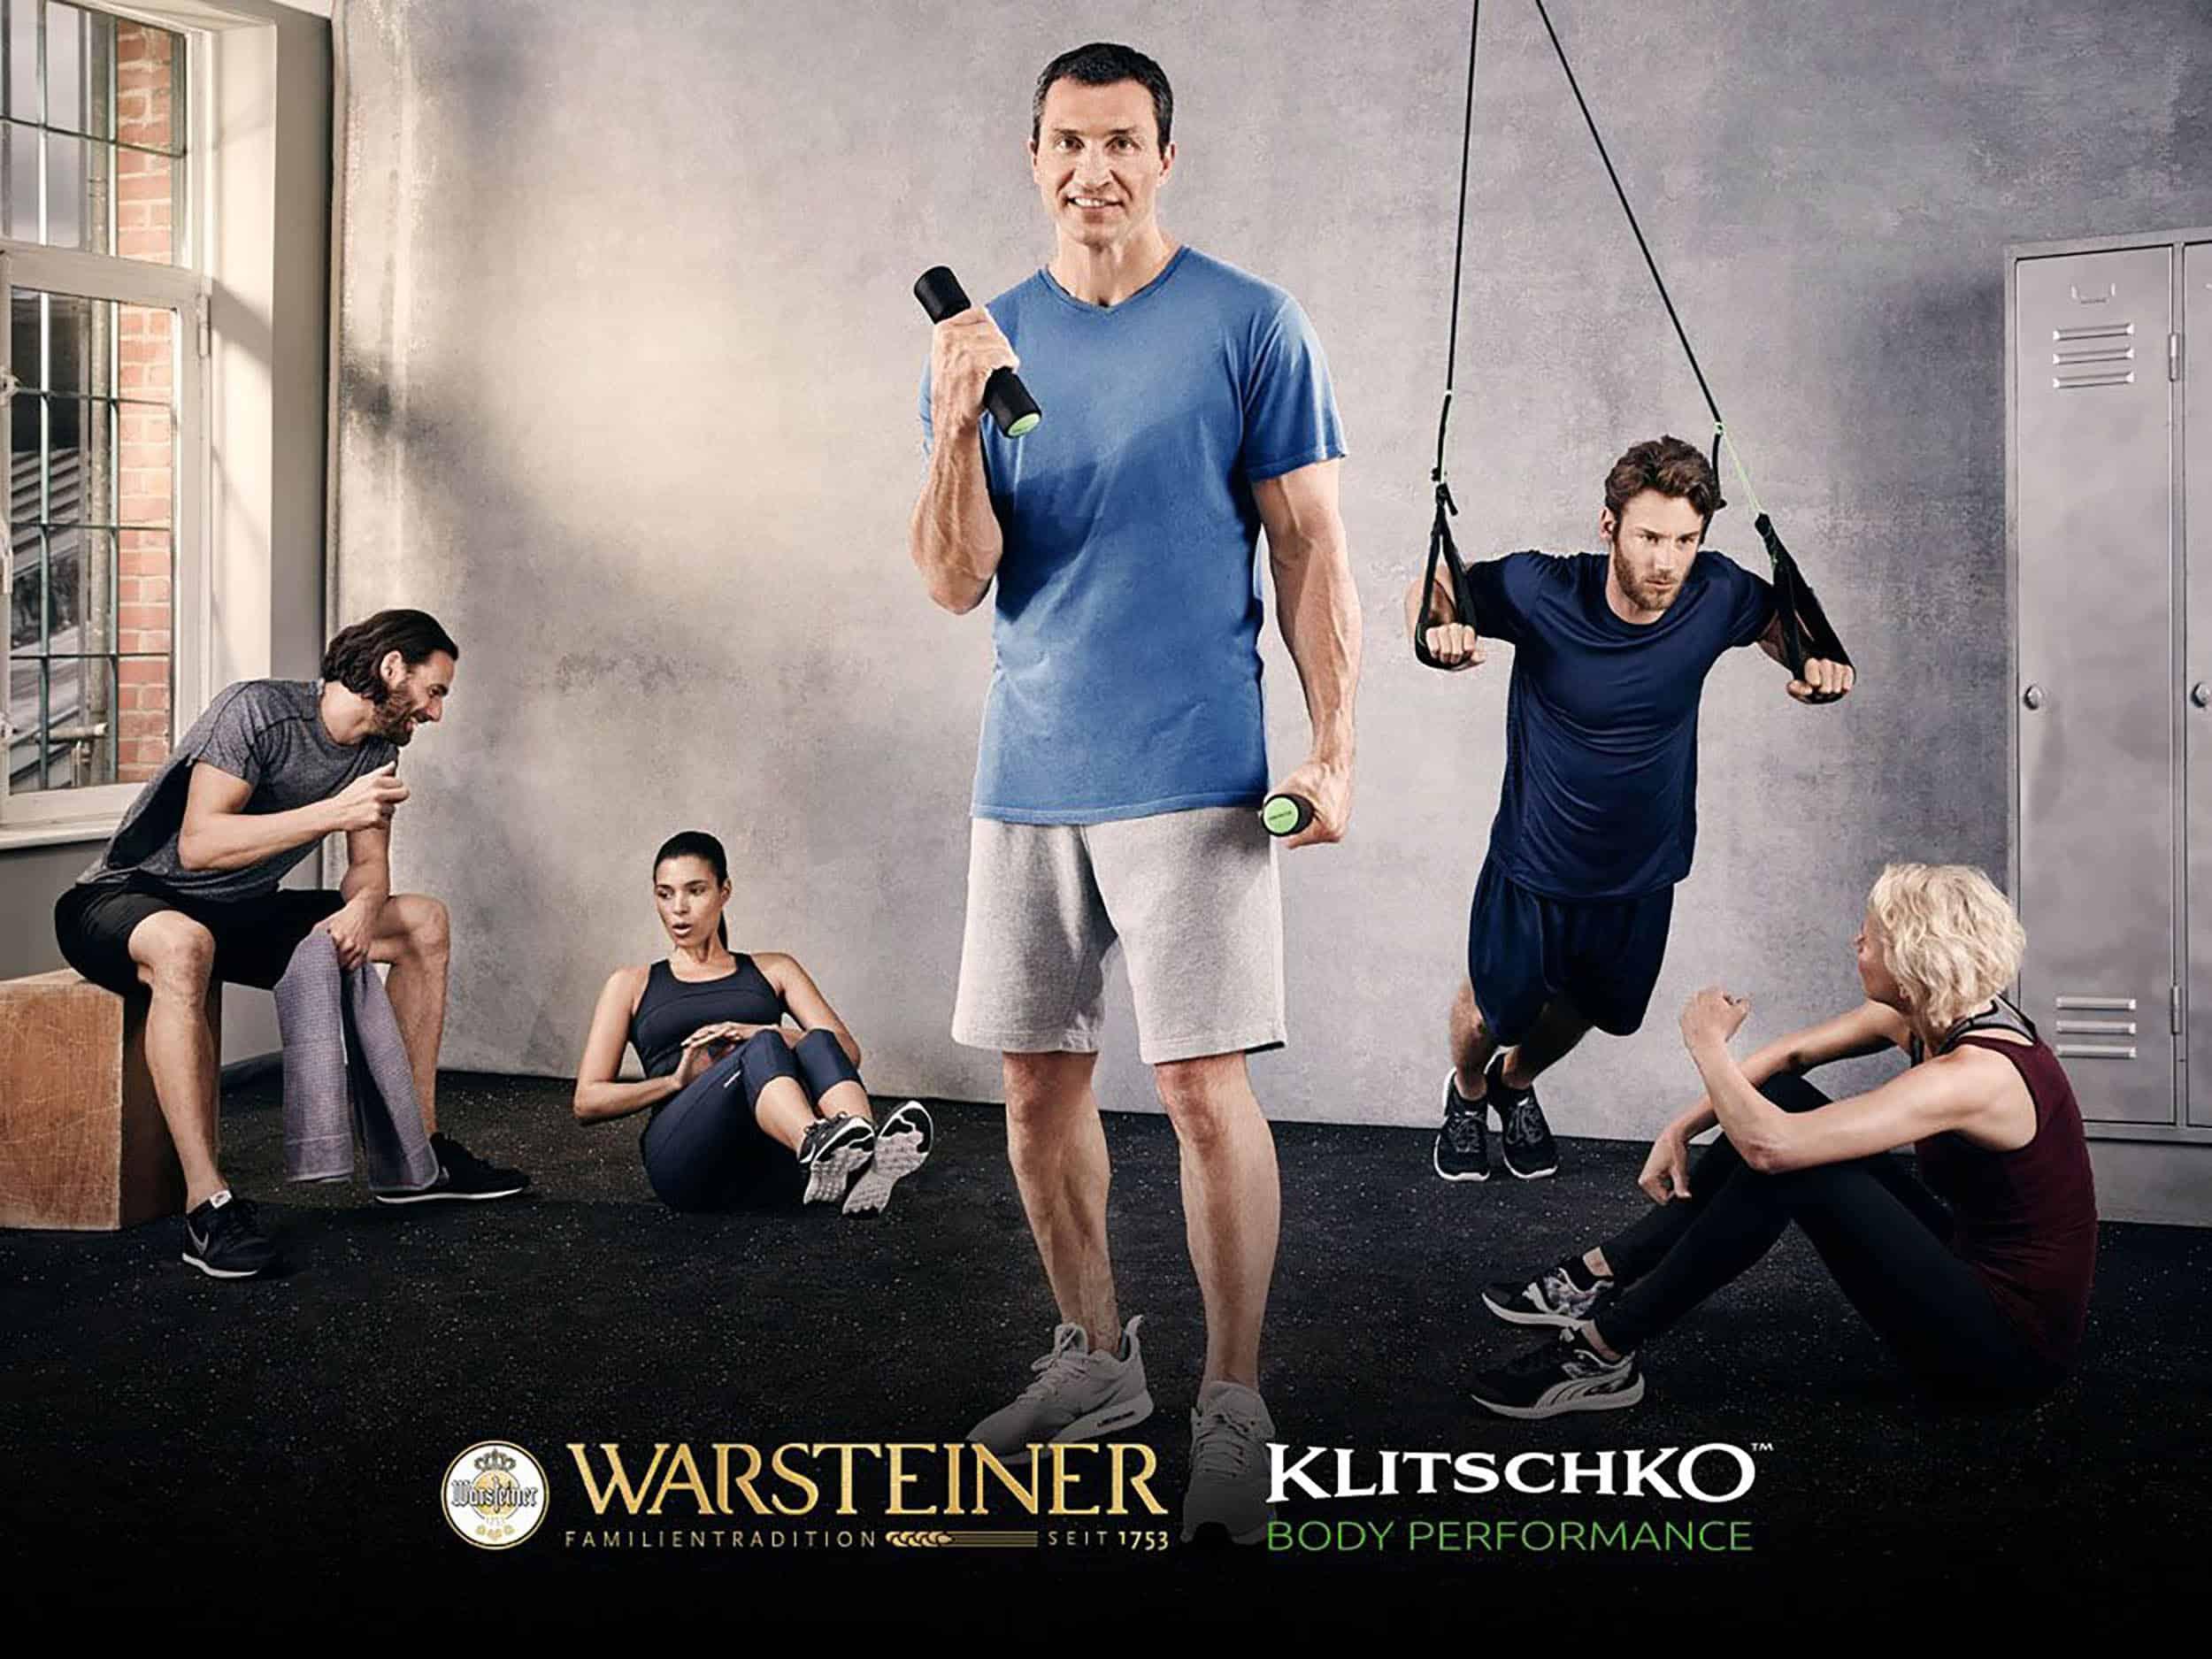 studio-ignatov-klitschko-warsteiner-imagekampagne-branding-03